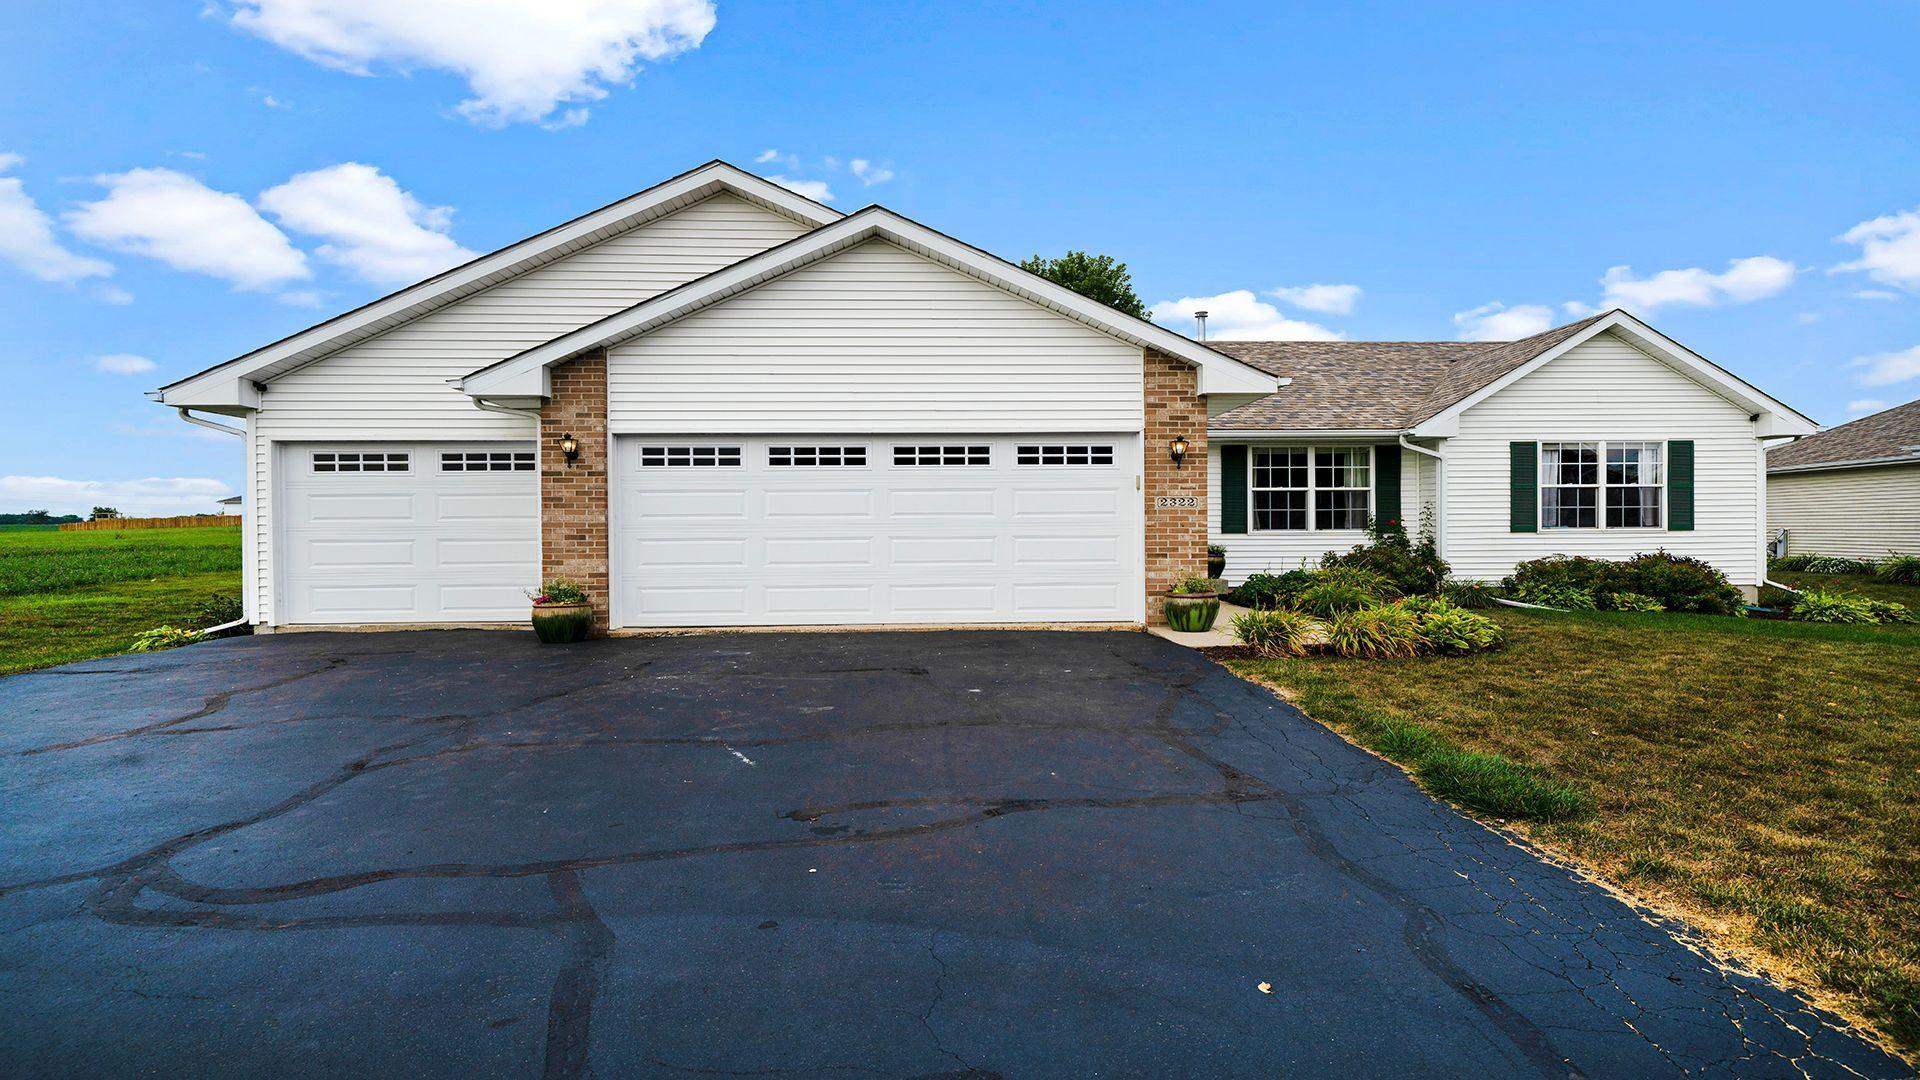 2322 Kristi Lane, Rockford, IL 61102 - #: 11172765